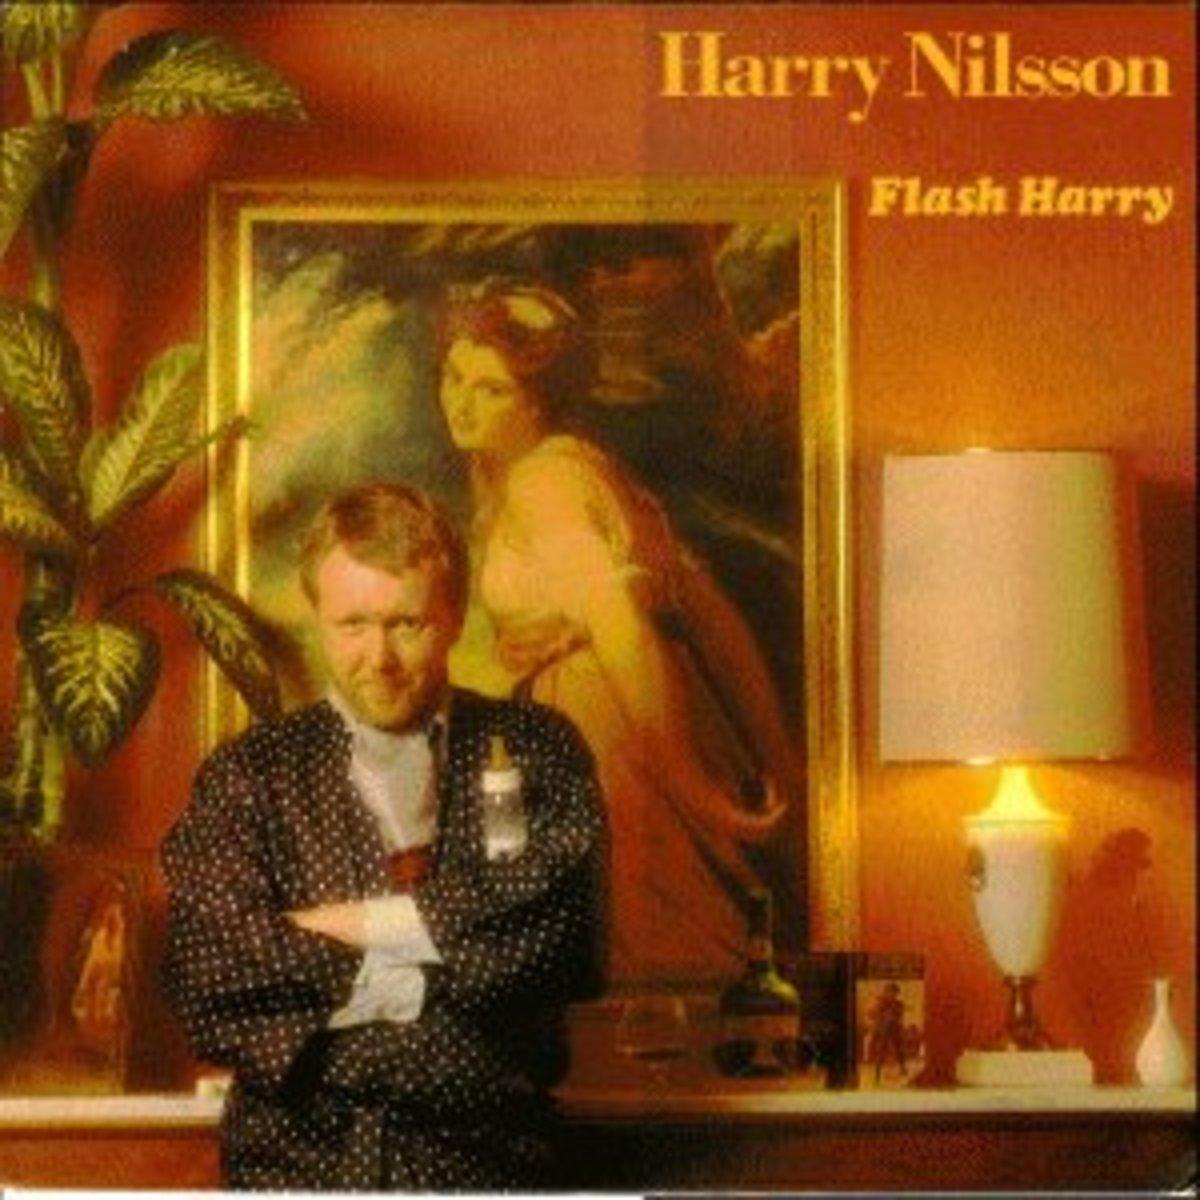 Harry_Nilsson_Flash_Harry